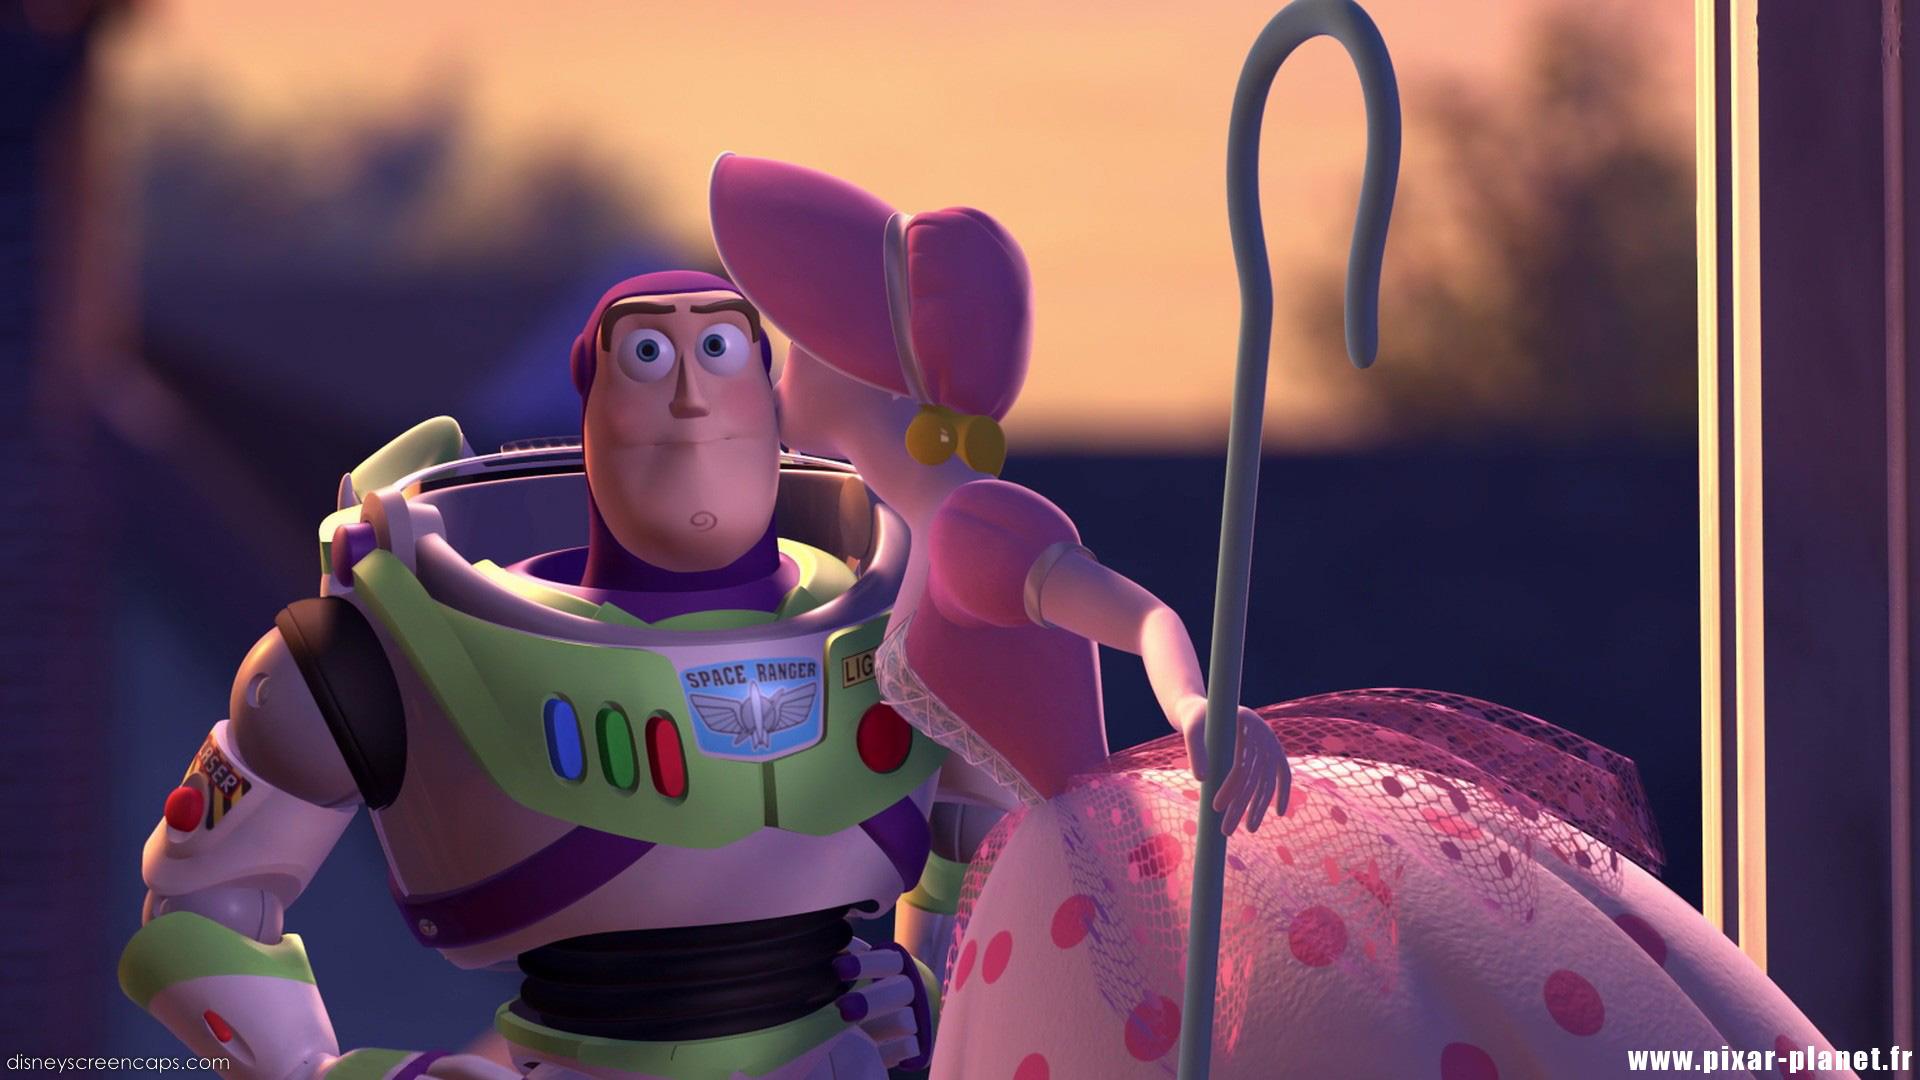 Pixar Planet Disney toy story 2